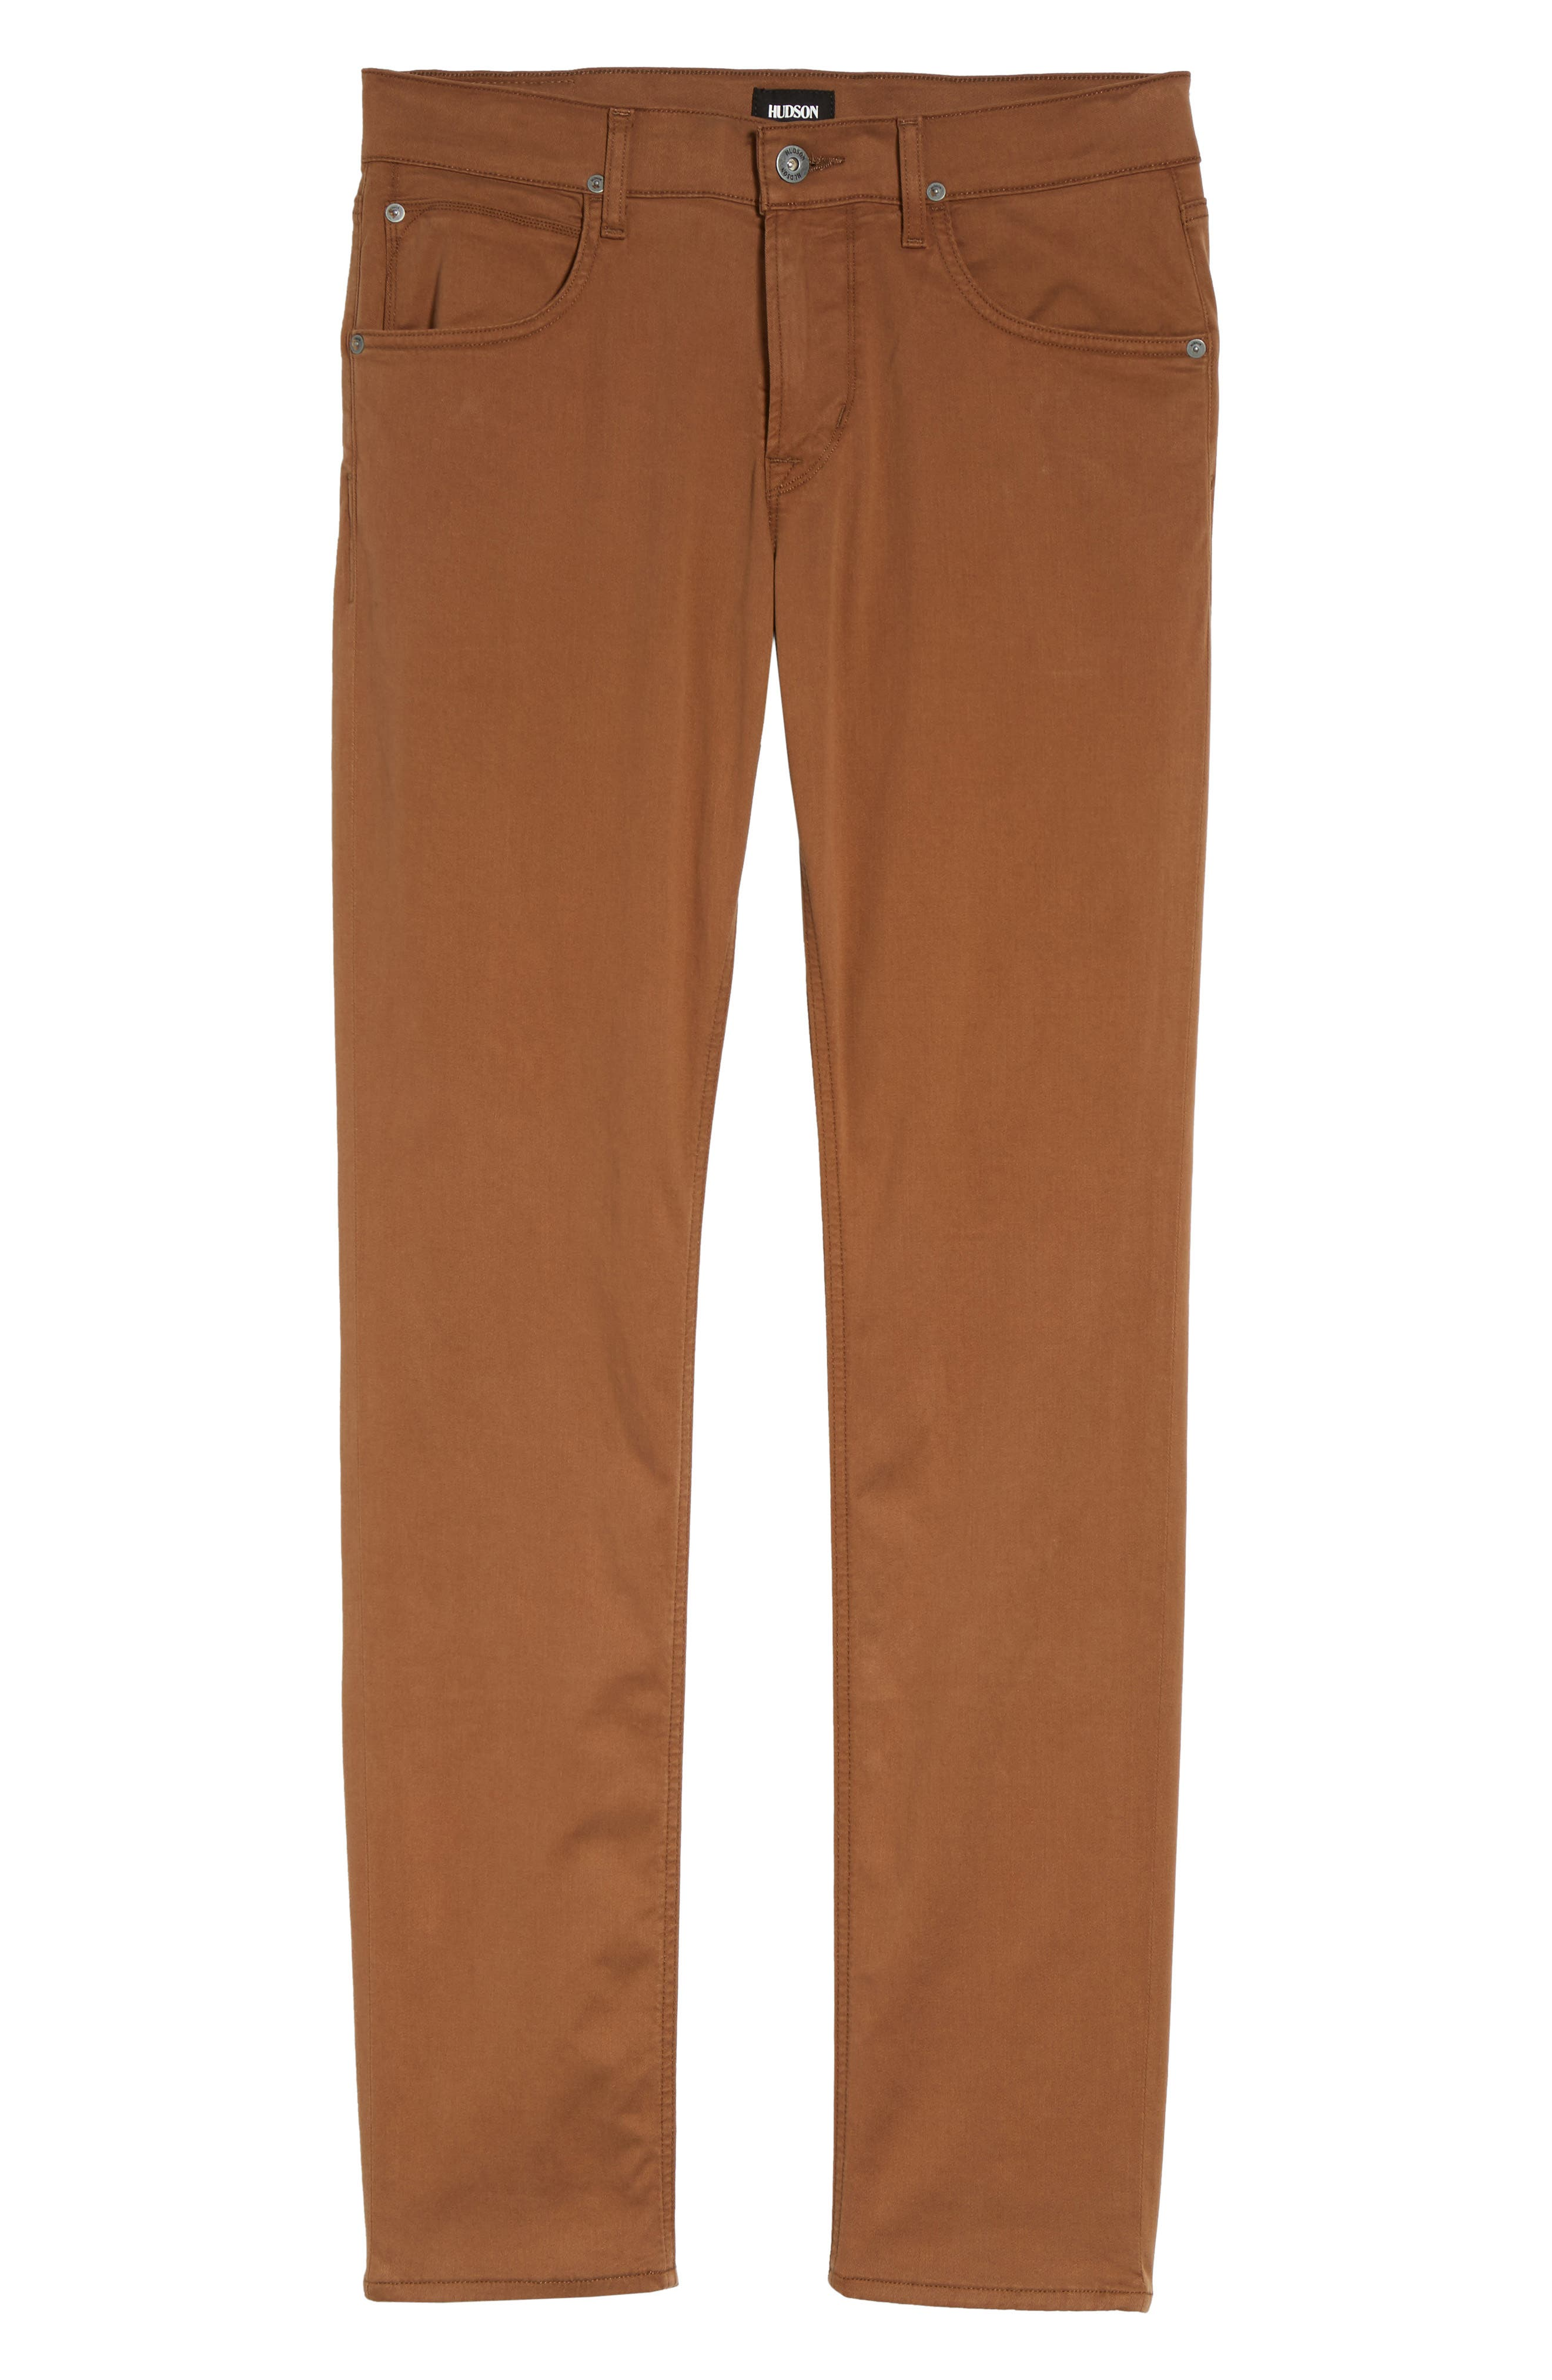 Blake Slim Fit Jeans,                             Alternate thumbnail 6, color,                             Masonite